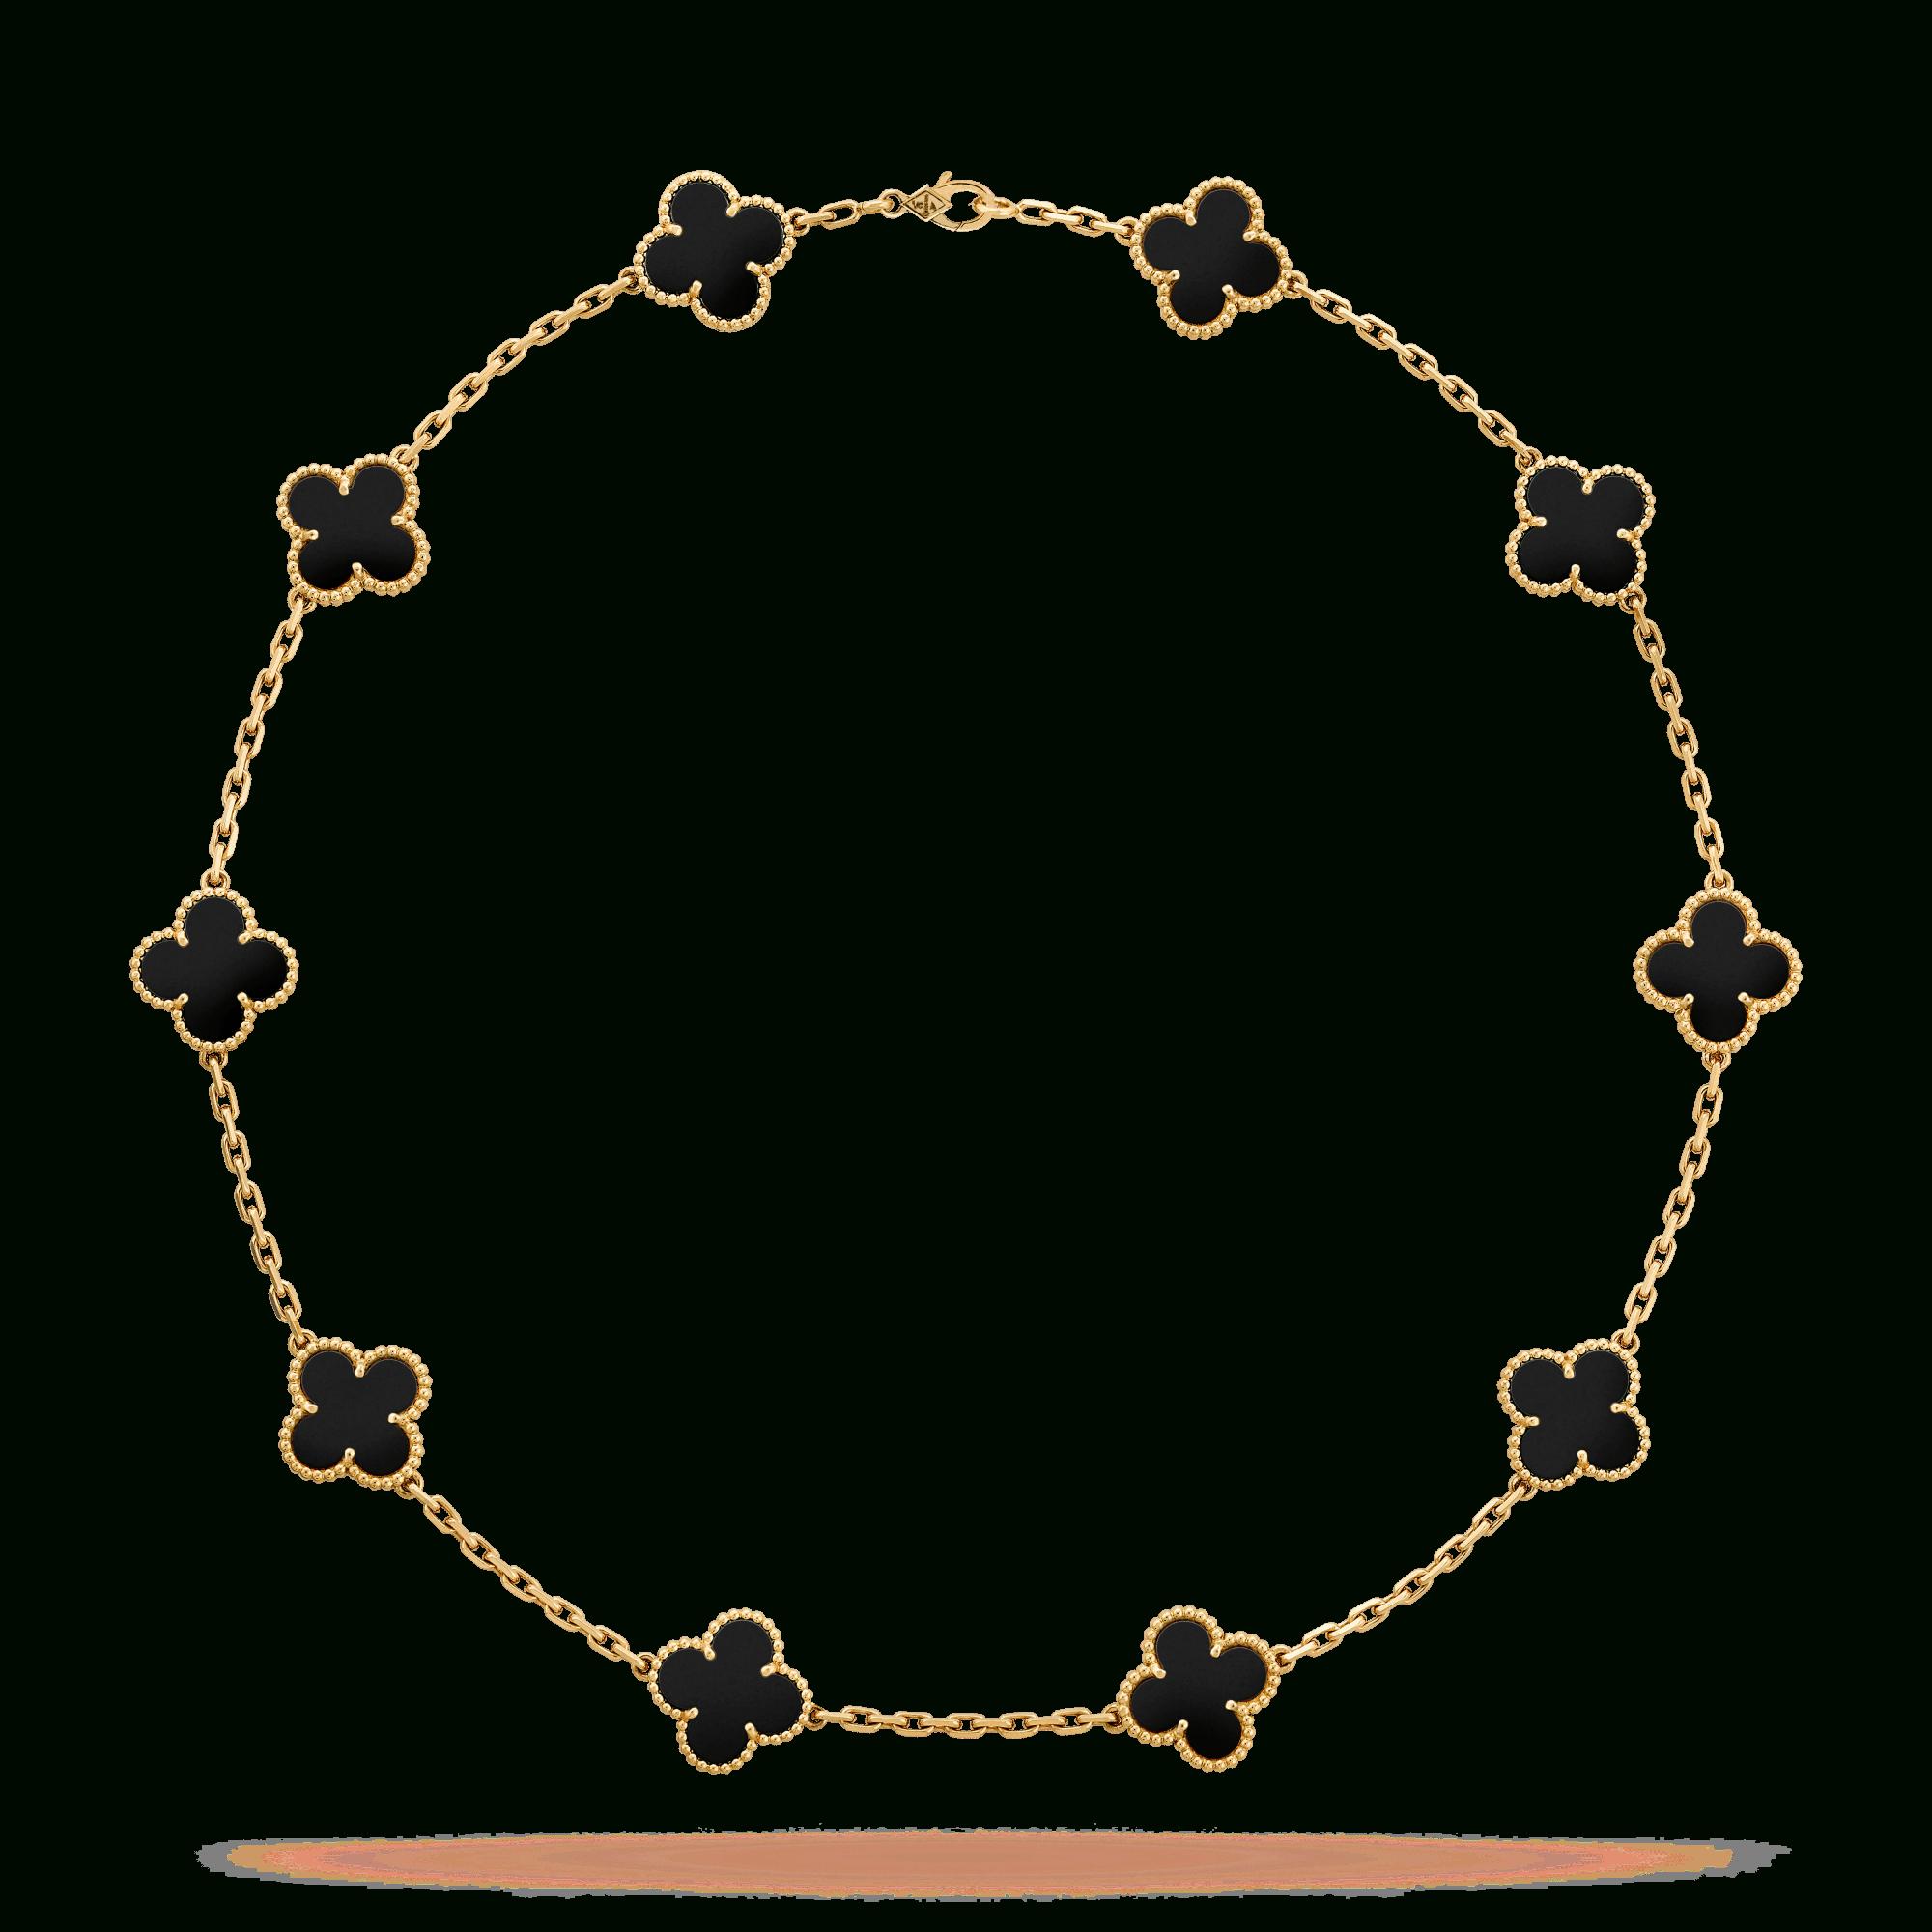 Vintage Alhambra Necklace, 10 Motifs – Vcara42700  Van Cleef & Arpels Intended For Recent Vintage Circle Collier Necklaces (View 22 of 25)